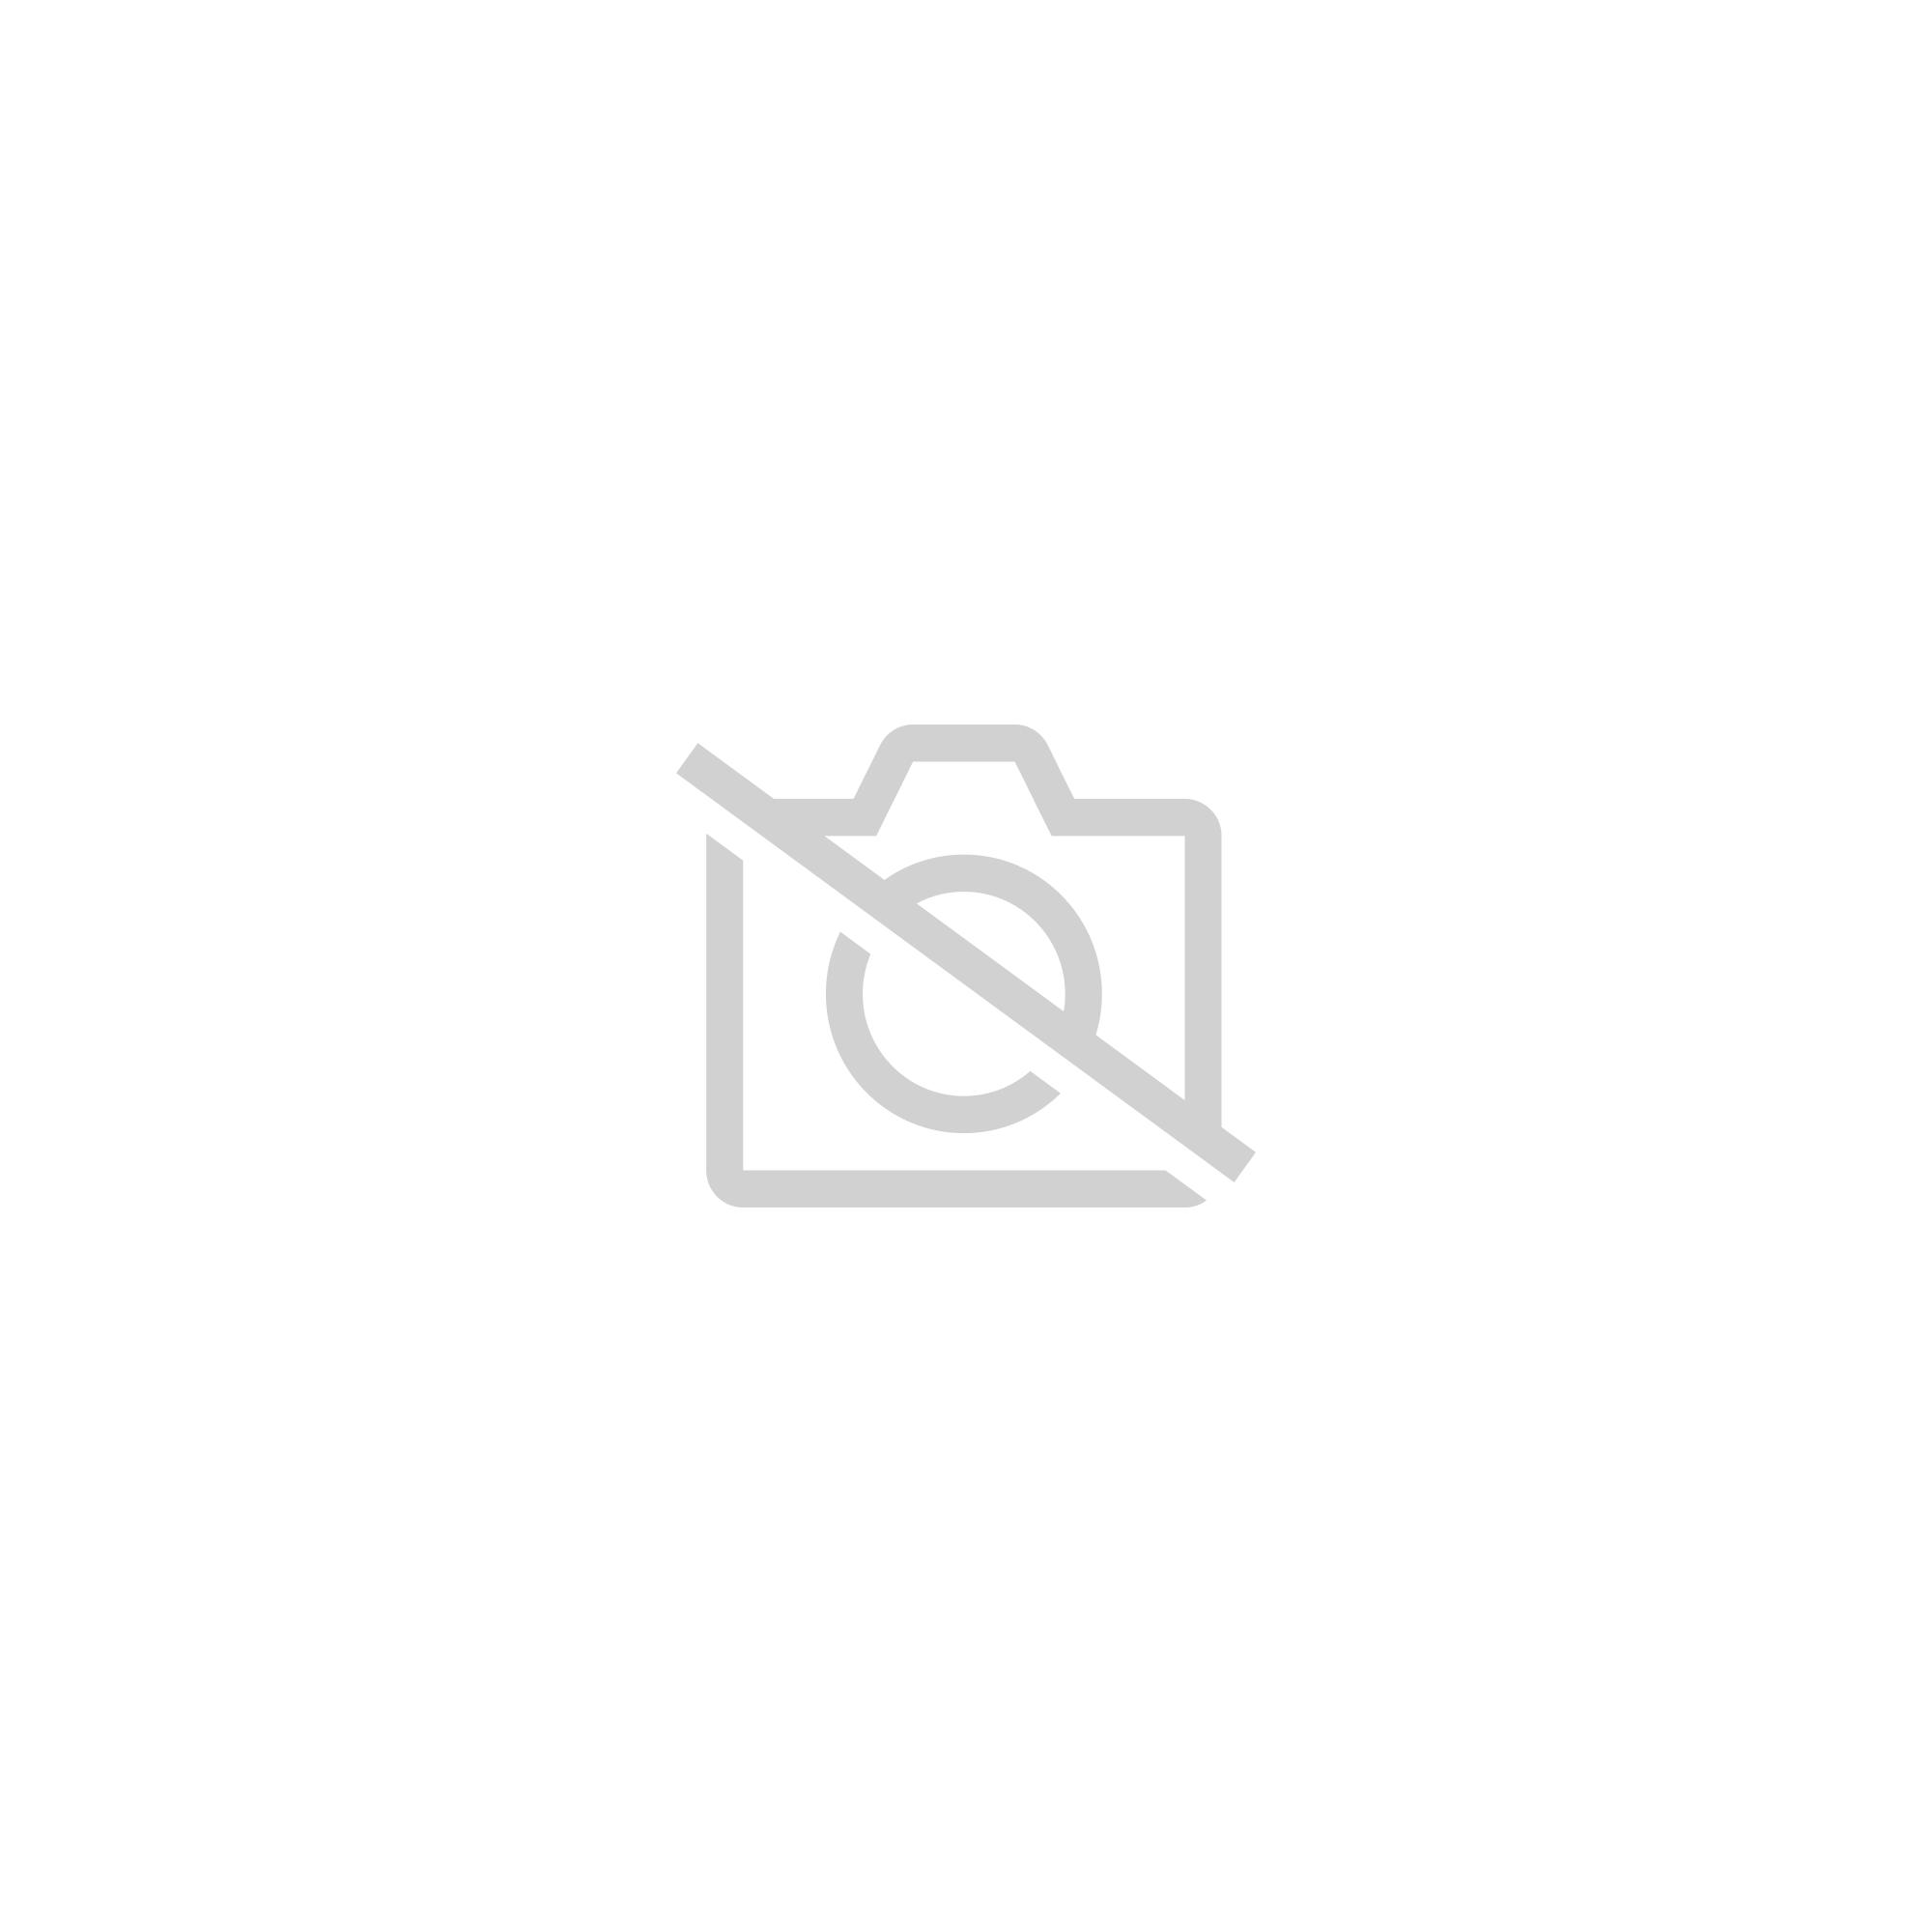 Table Pliante Portable Table De Camping Valise Jardin150cm Neuf ...